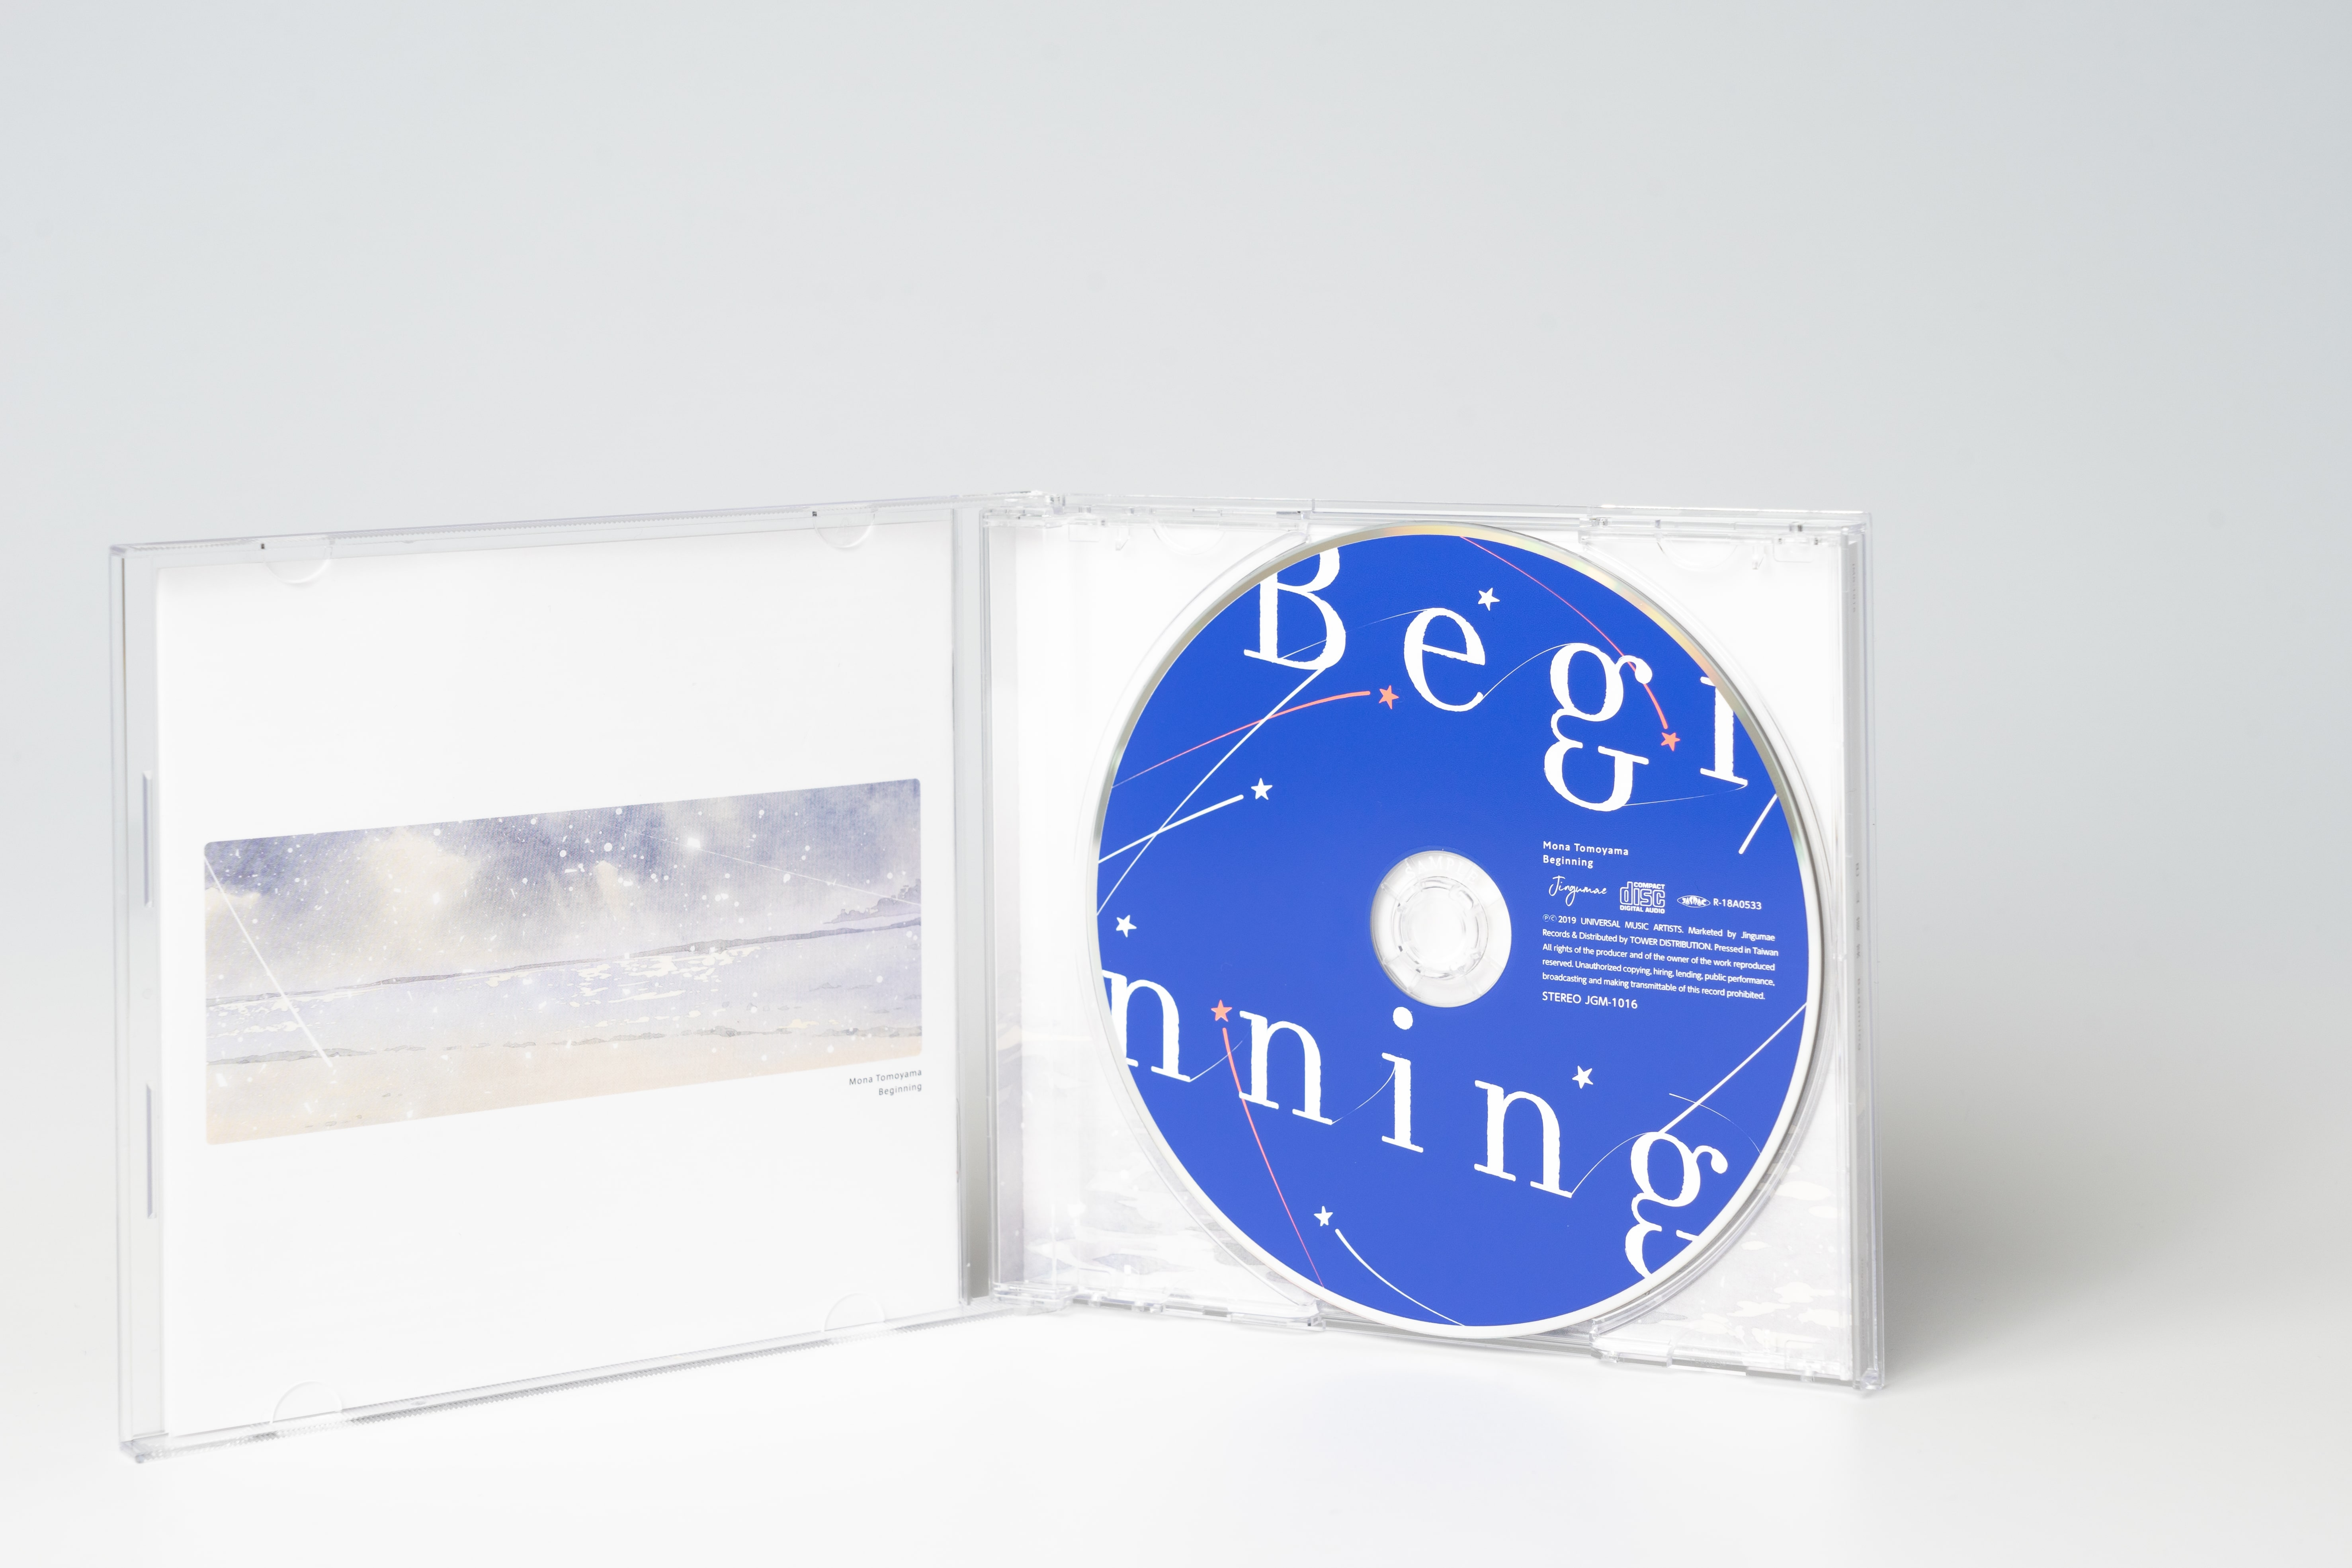 巴山萌菜/Beginning